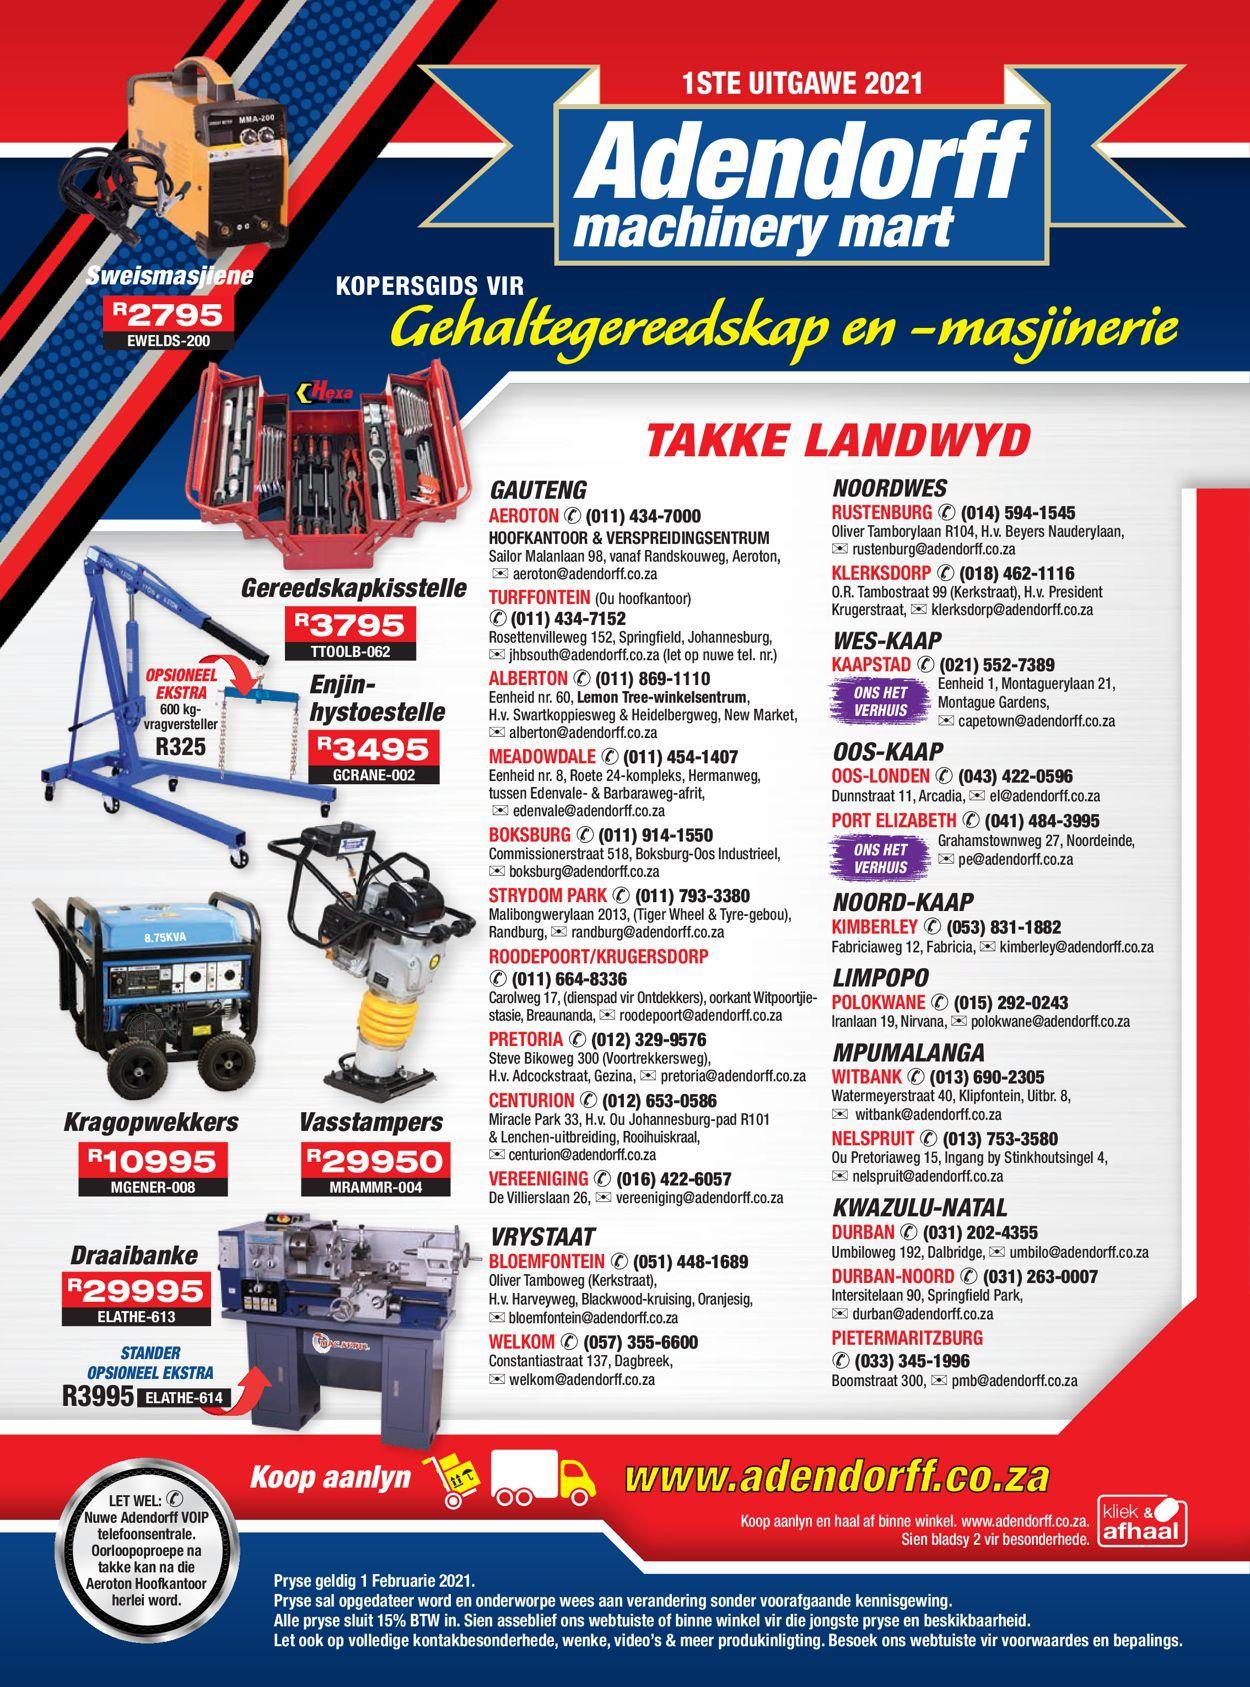 Adendorff Machinery Mart Catalogue - 2021/02/01-2021/02/07